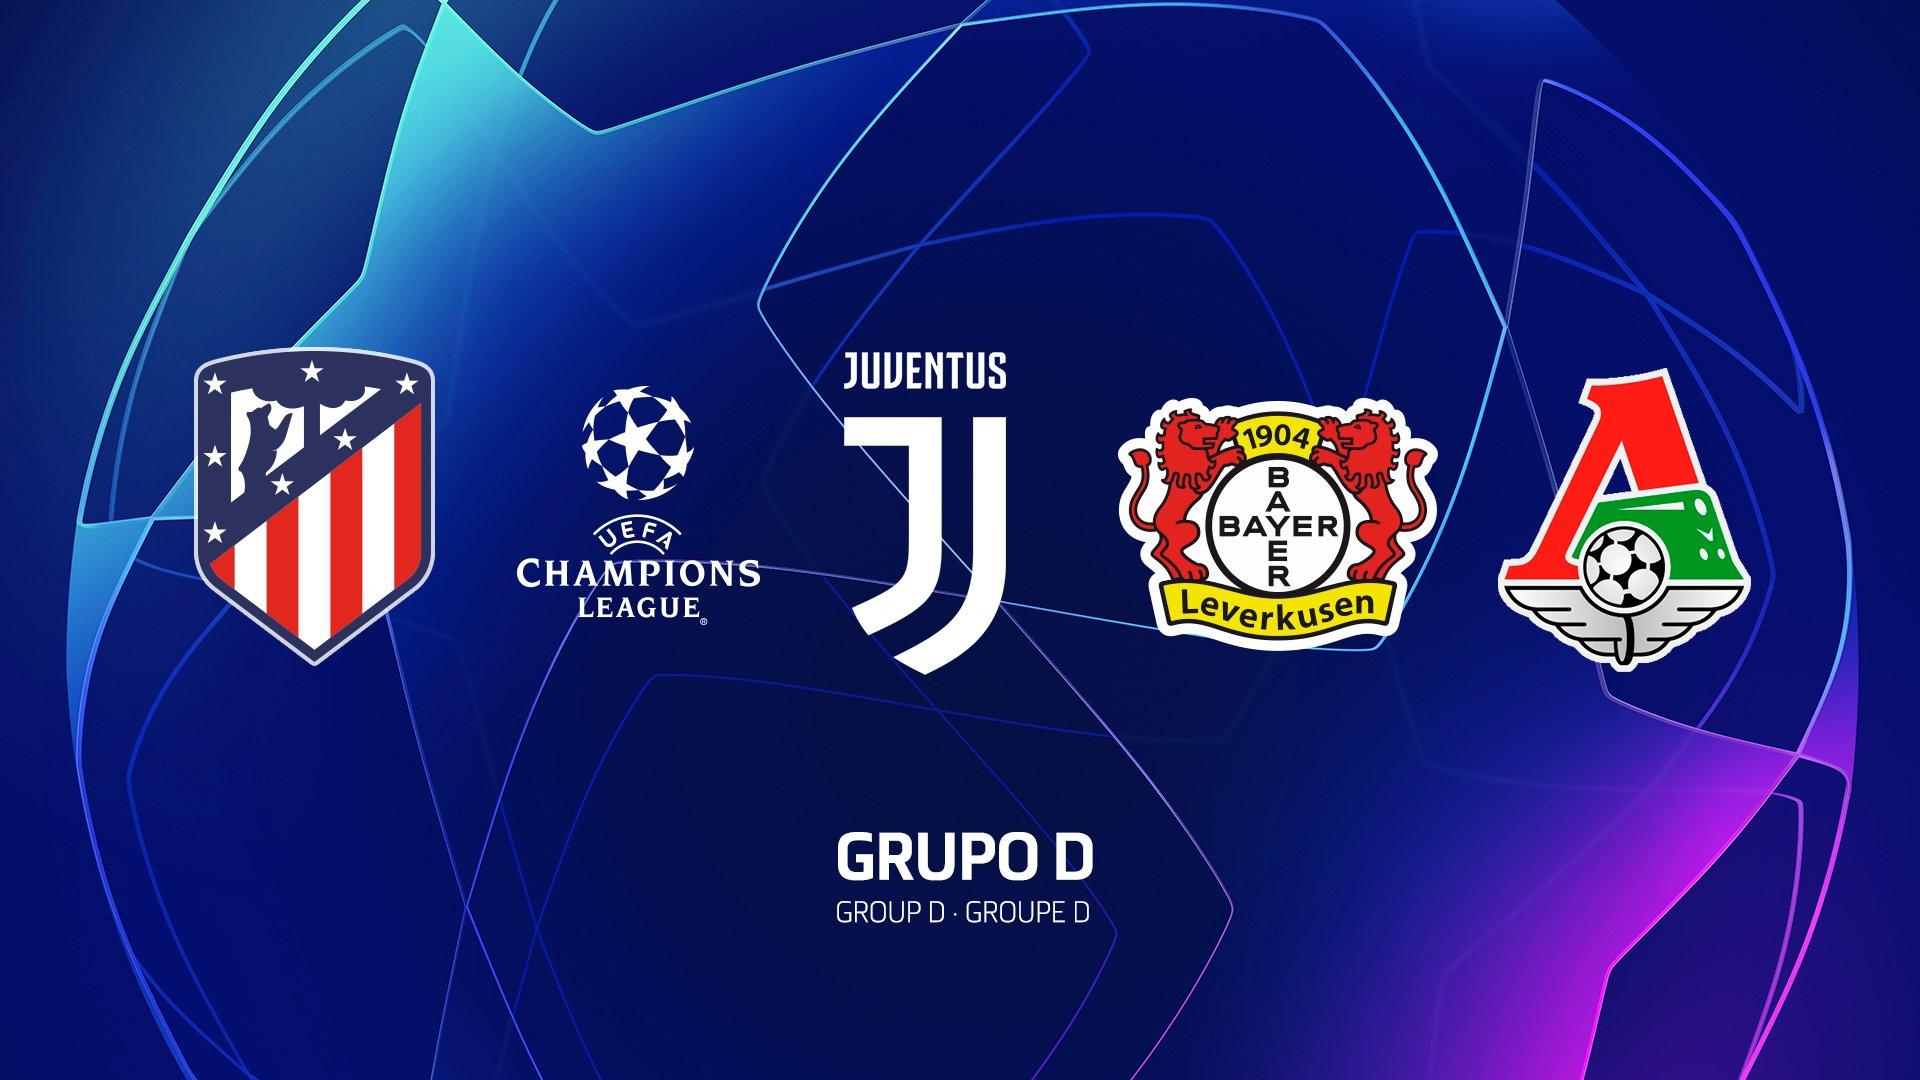 Champions League 2019/20 | Group D EDJyZNaWwAEJuZE